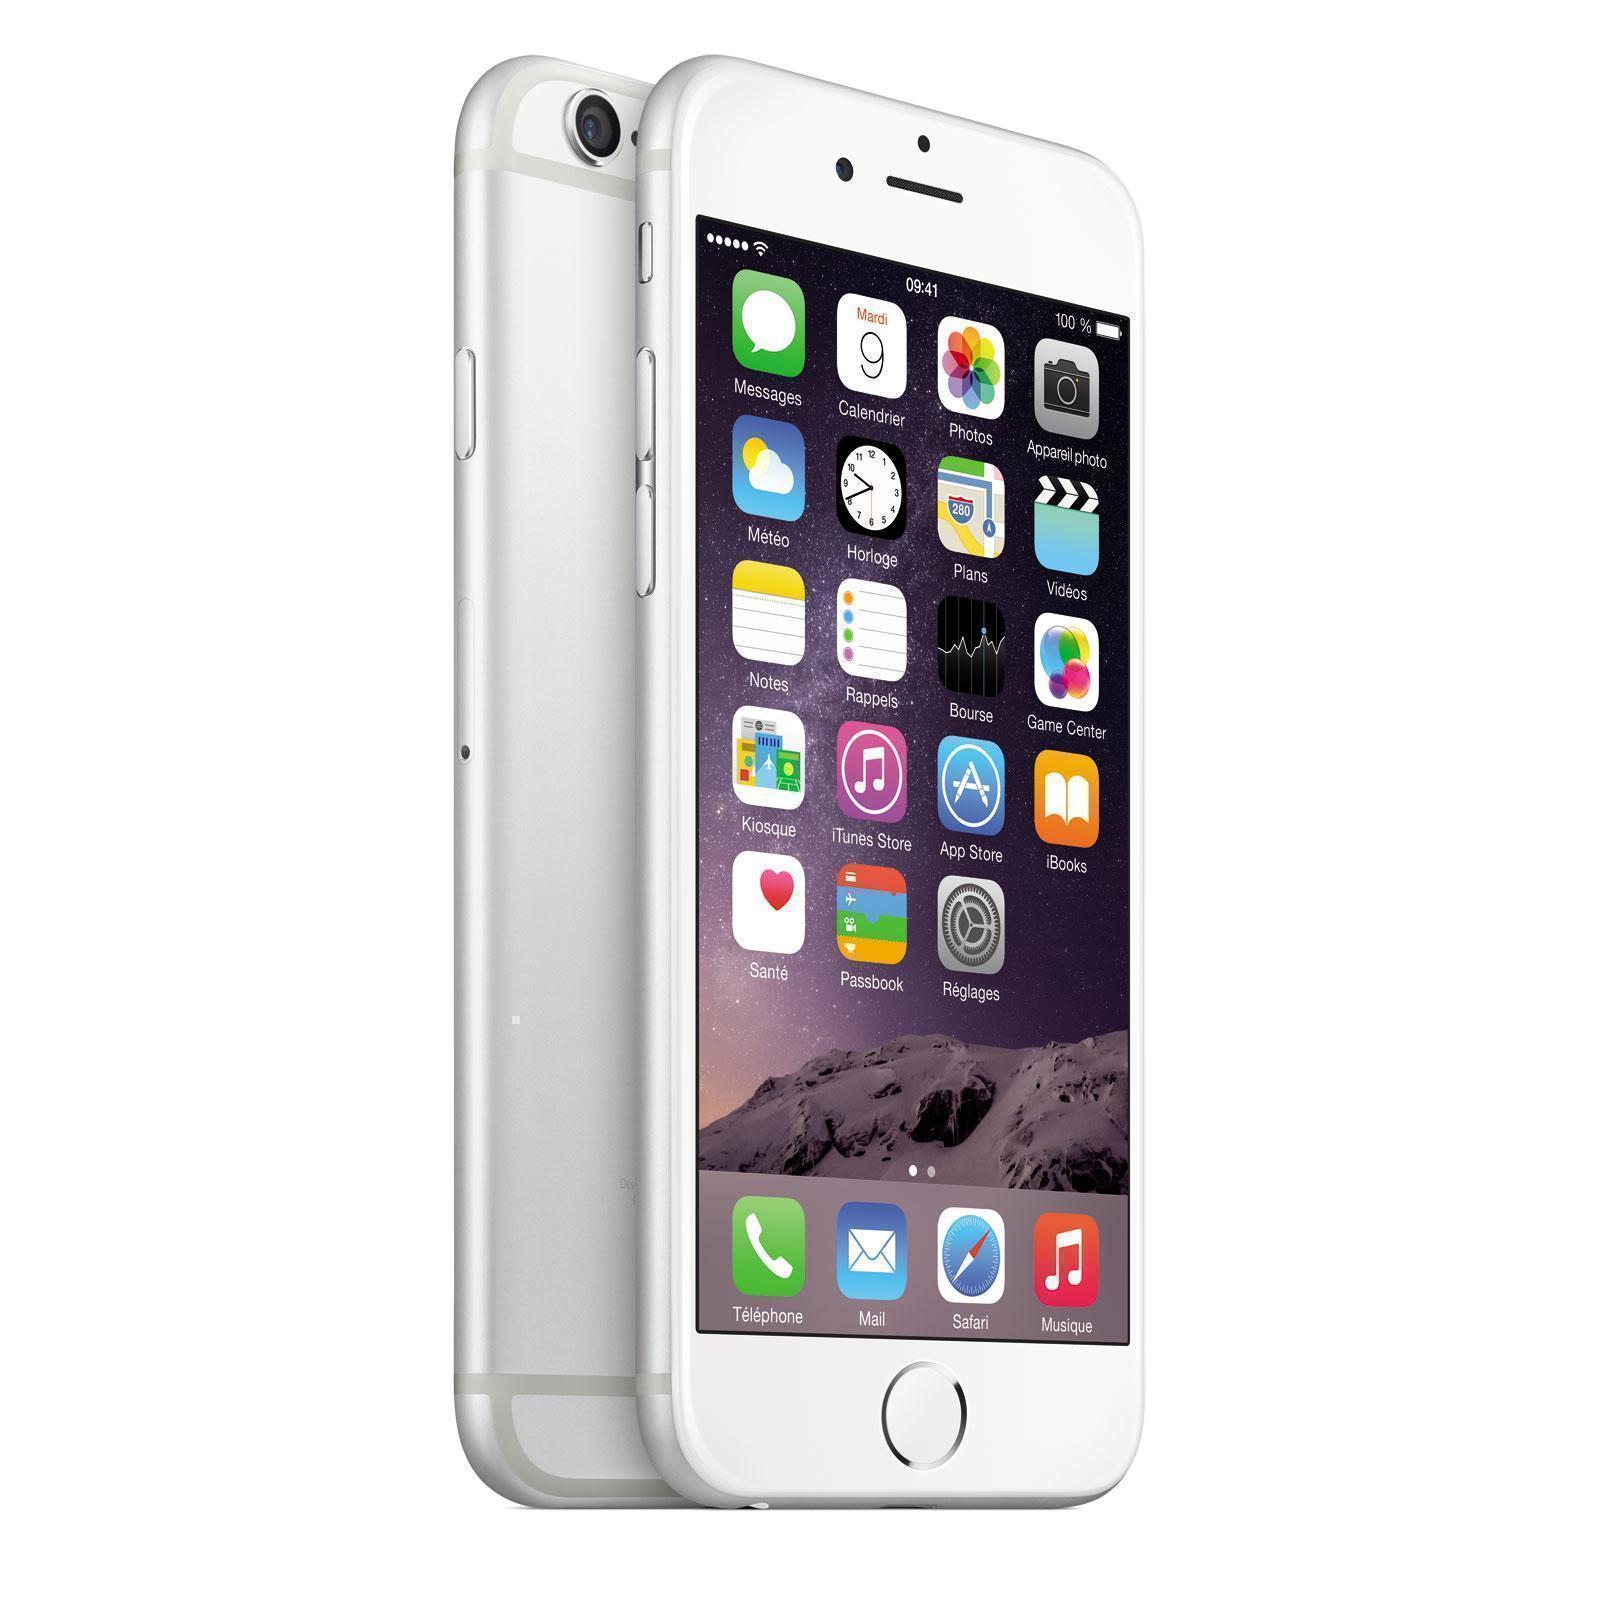 iPhone 6 128 GB - Silber - Ohne Vertrag